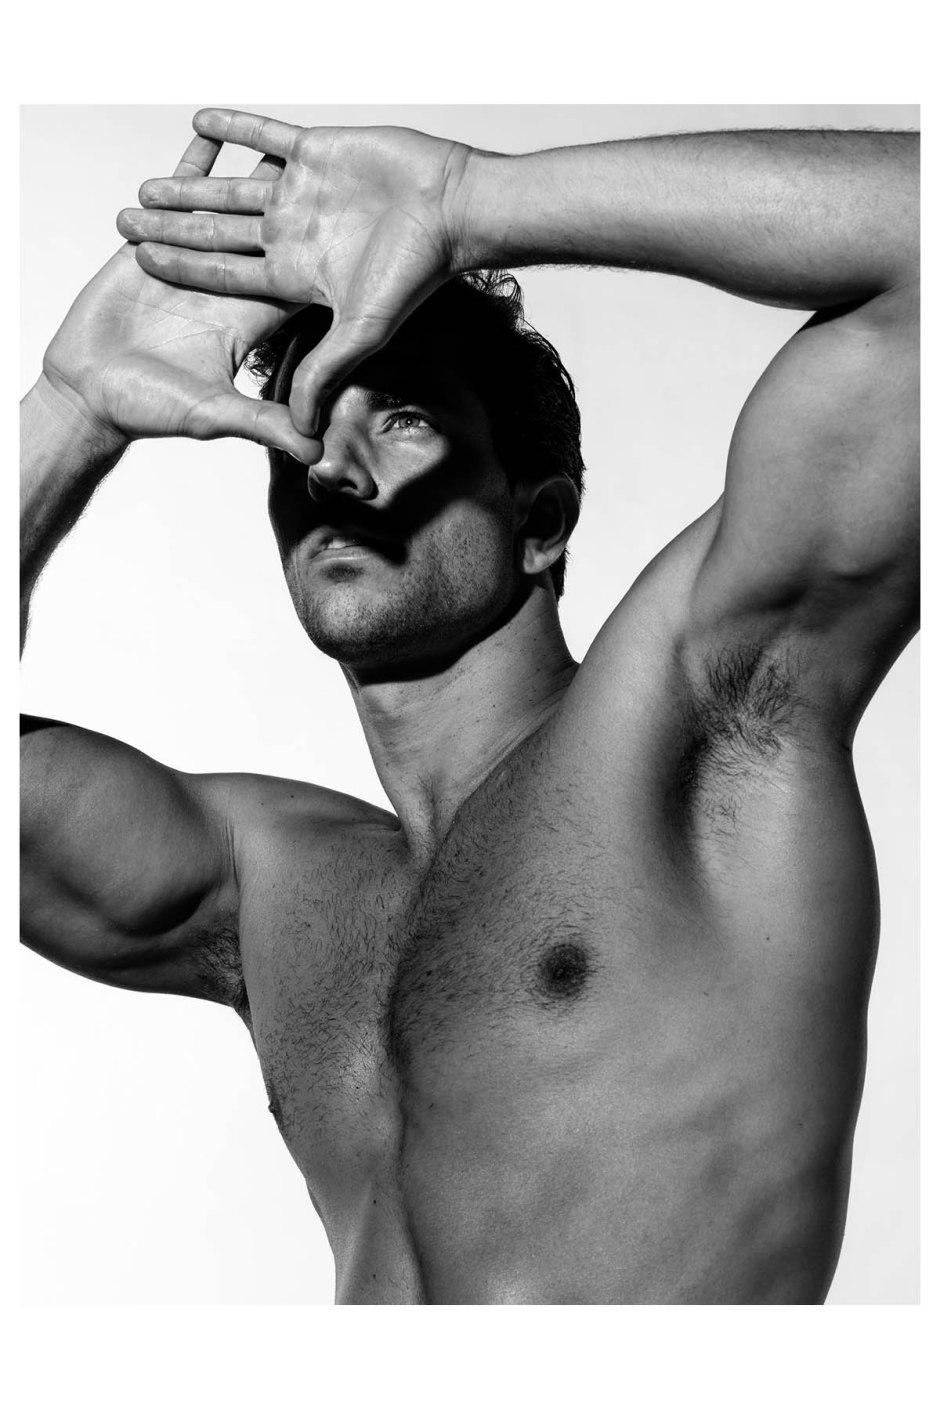 Hugo Tenorio by Wong Sim for Brazilian Male Model_005